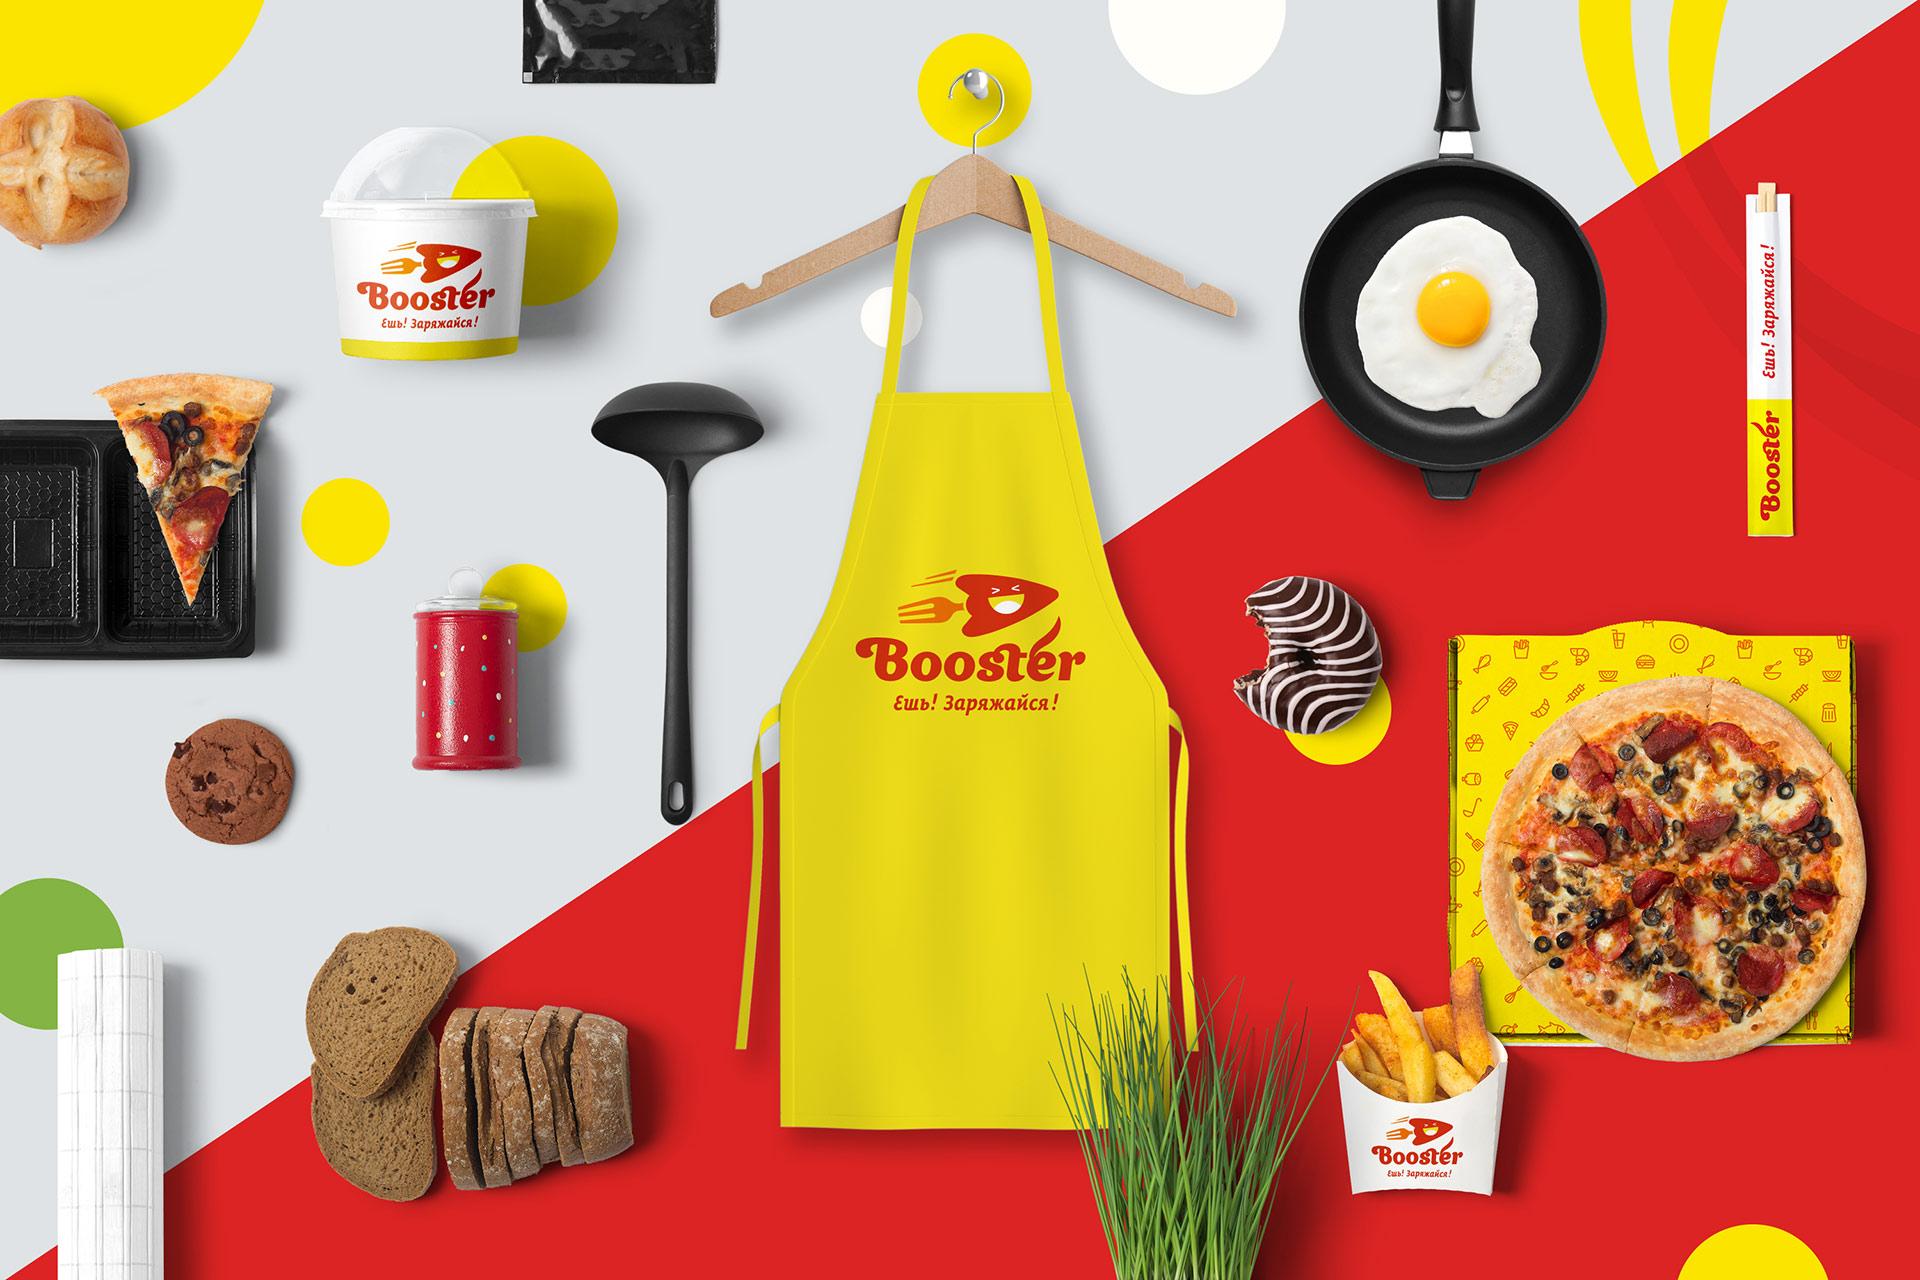 Booster логотип суши, служба доставки пиццы